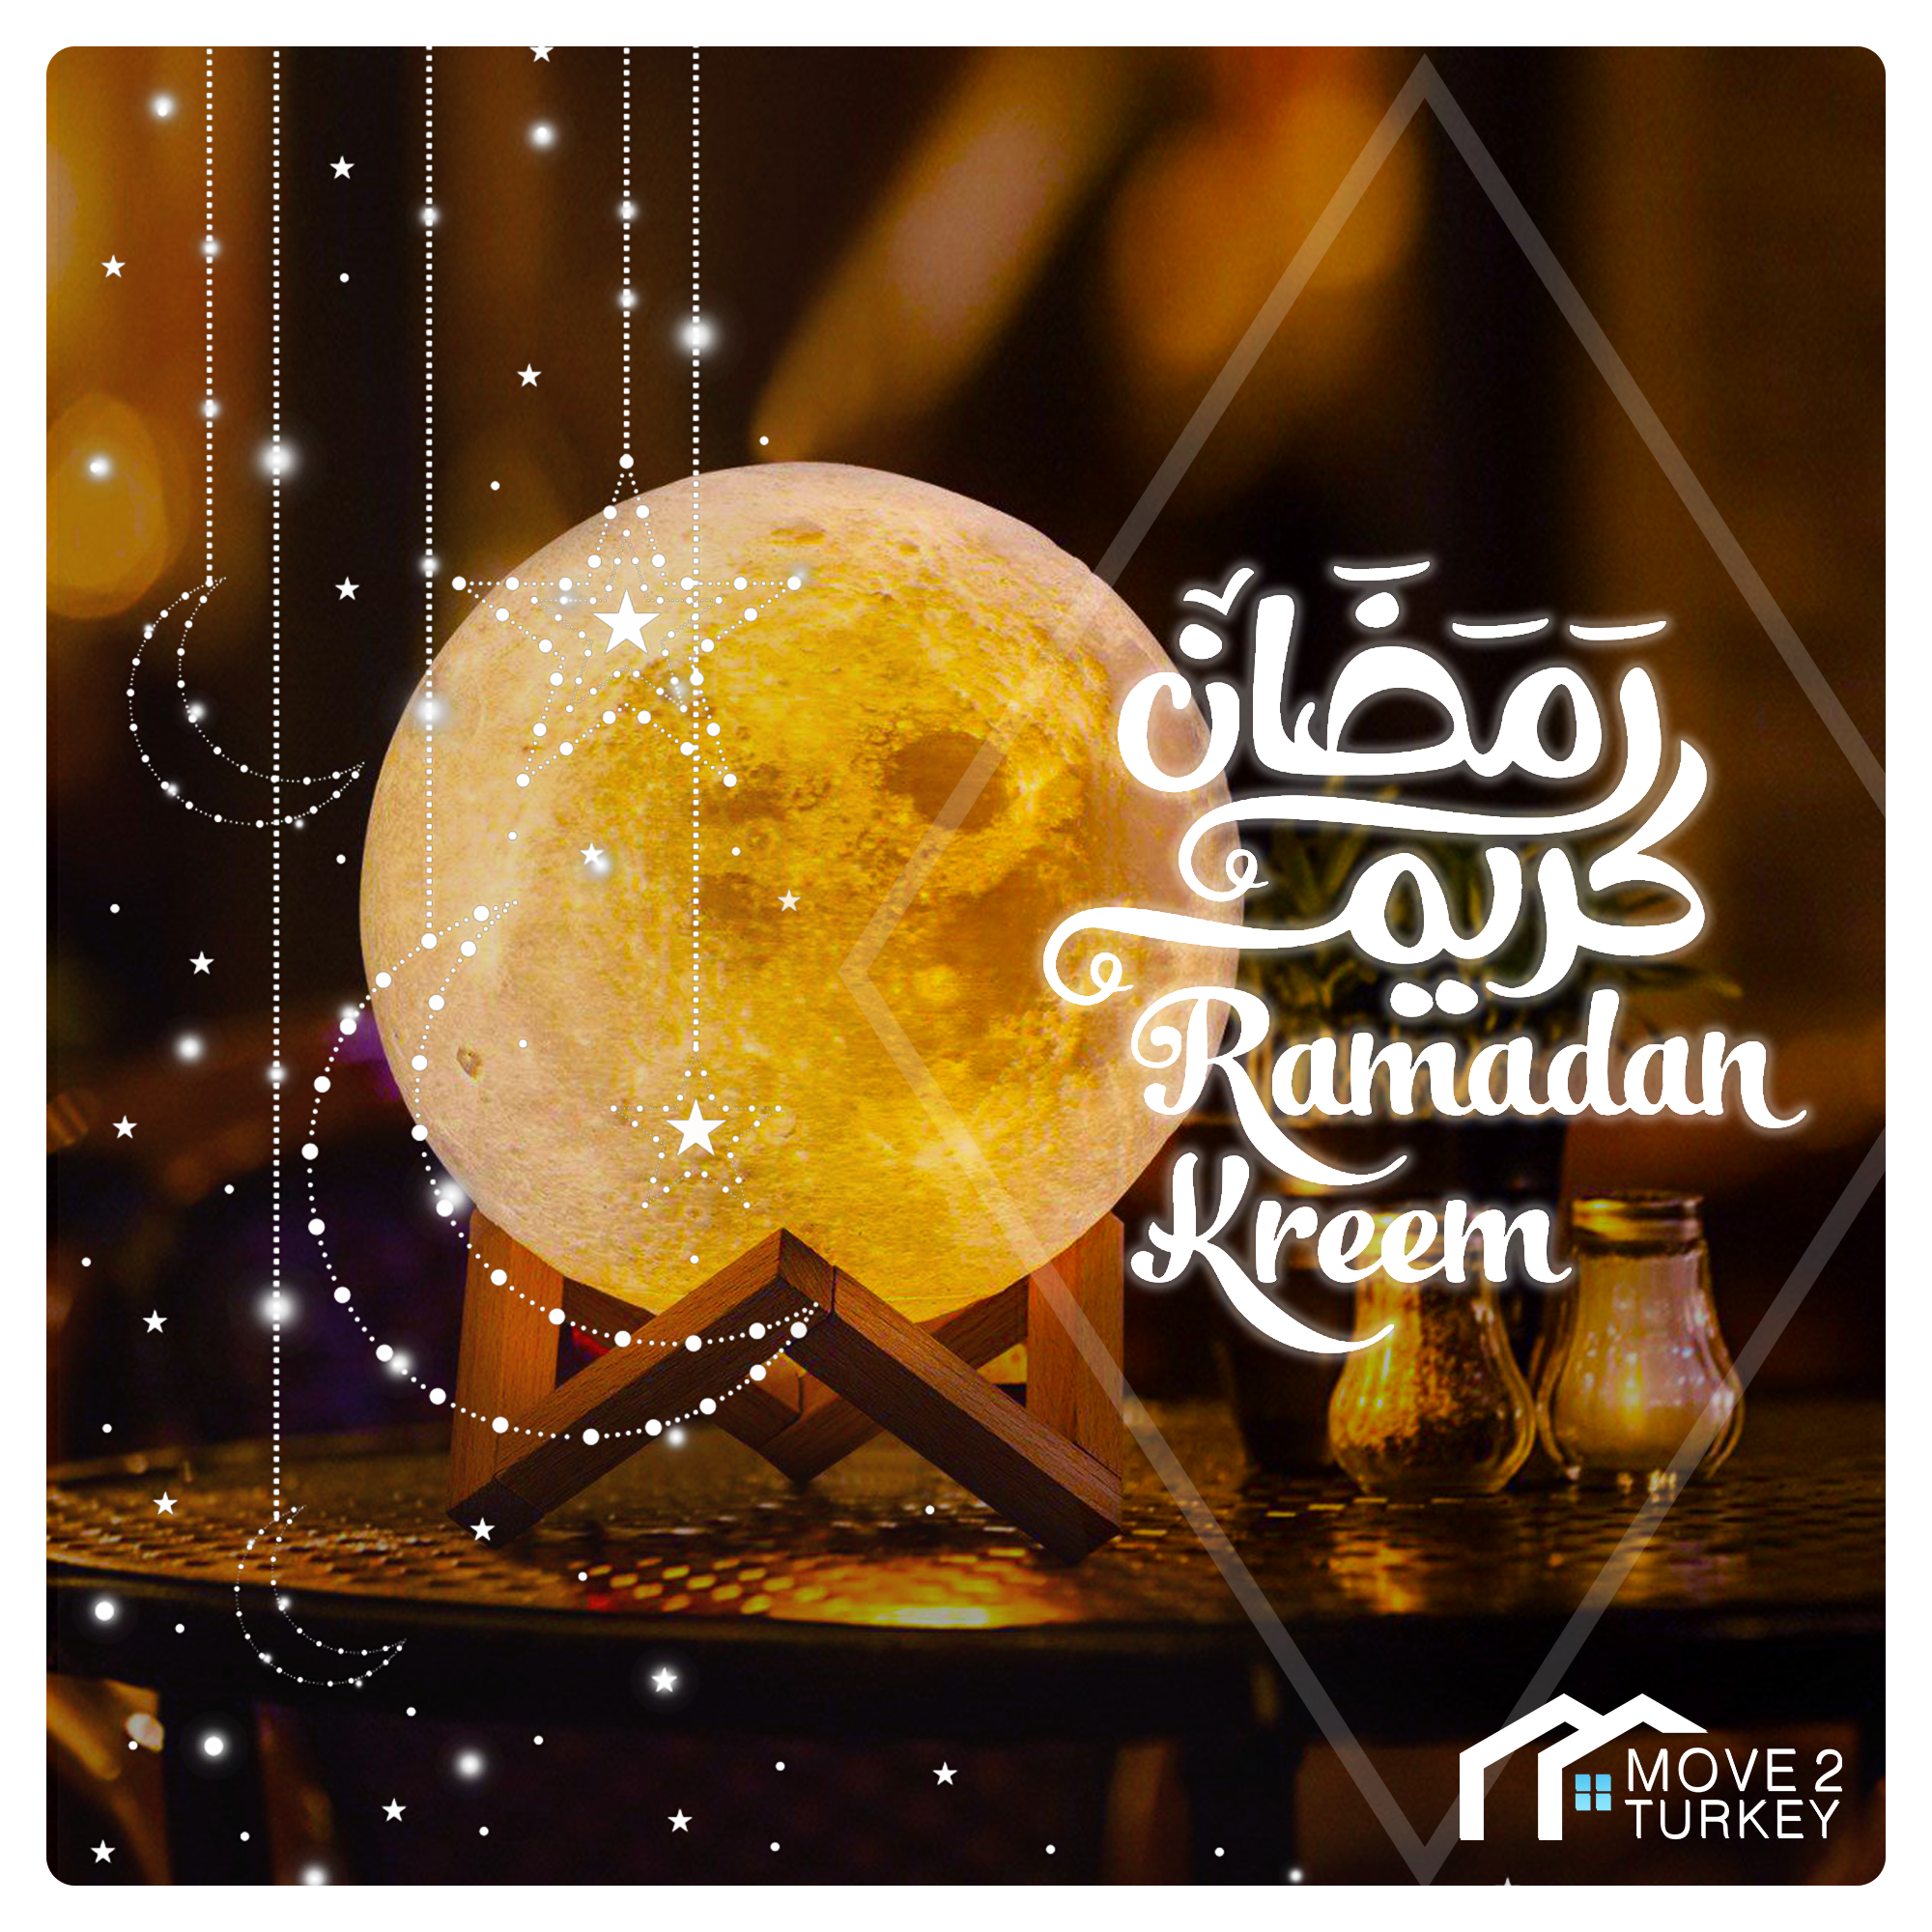 Ramadan Kareem Ramadan Ramadan In Turkey Ramadan Kareem